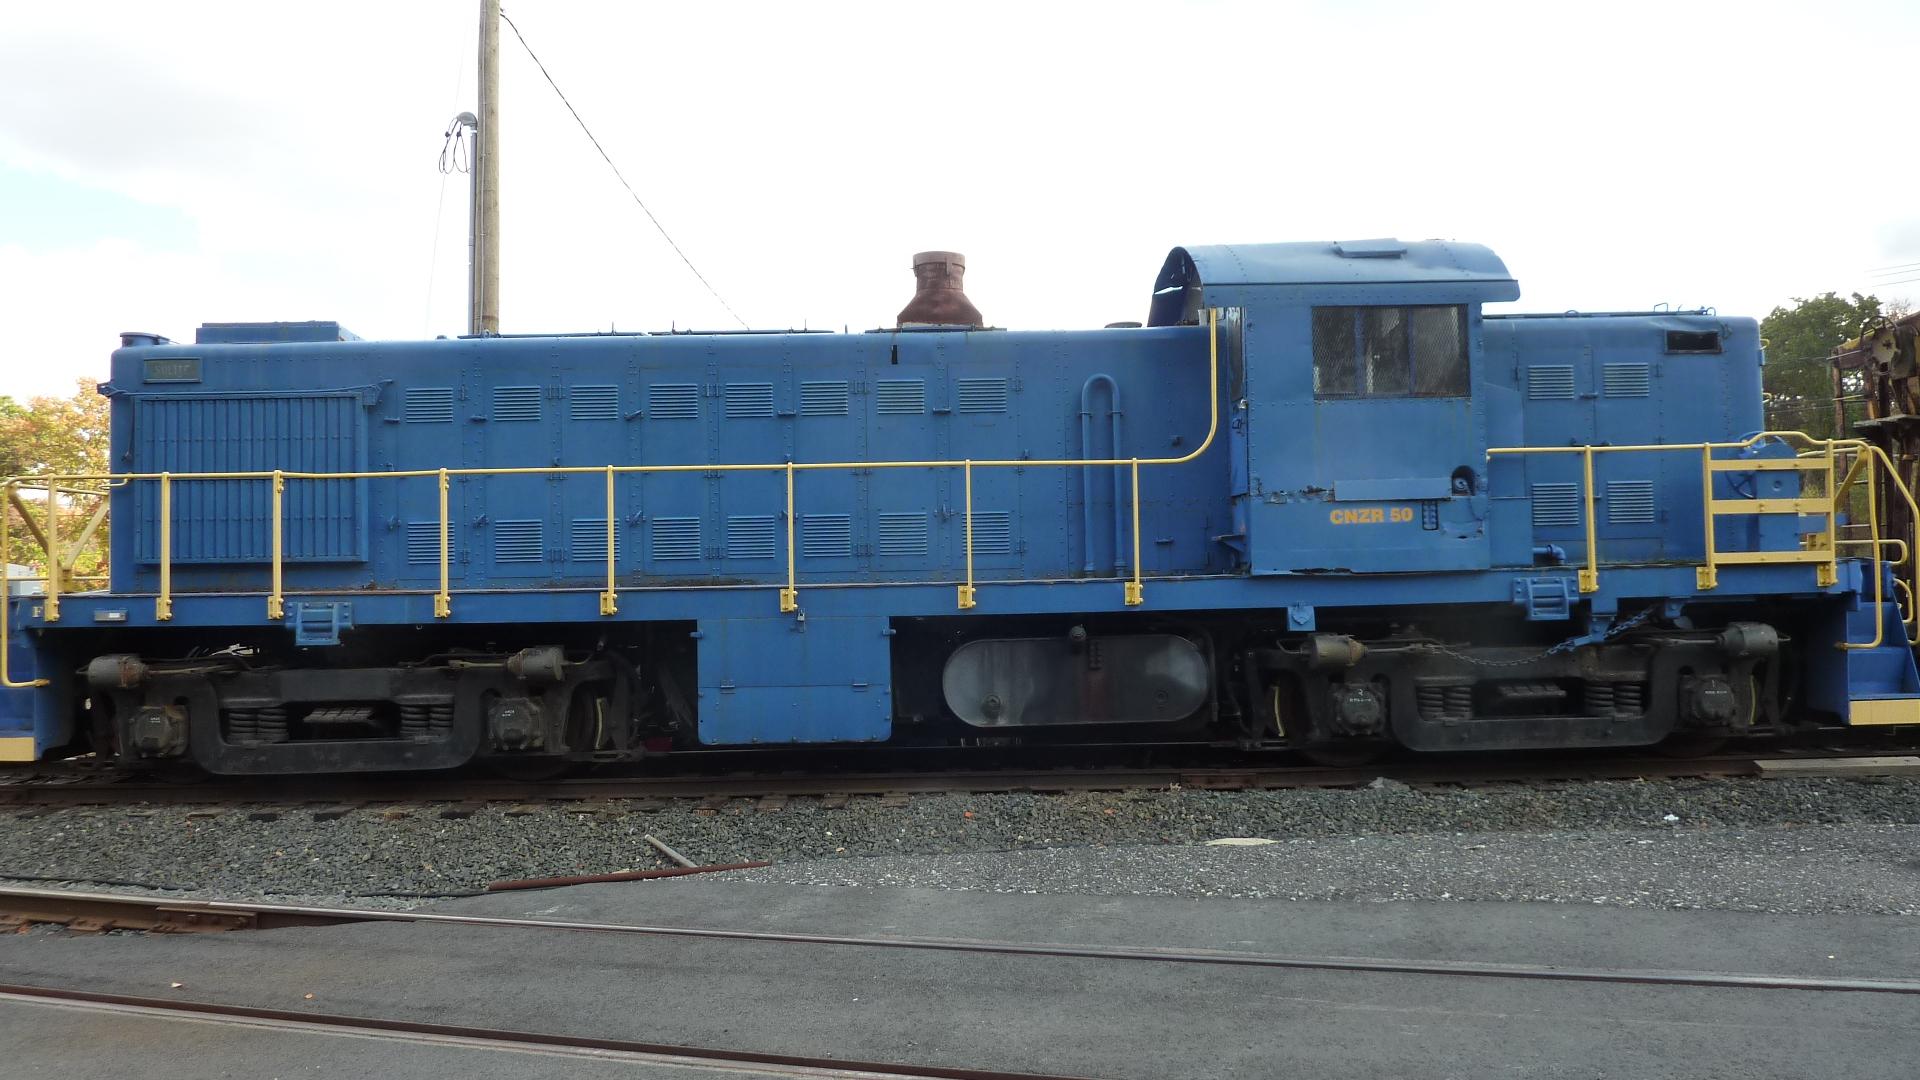 P1010730.JPG